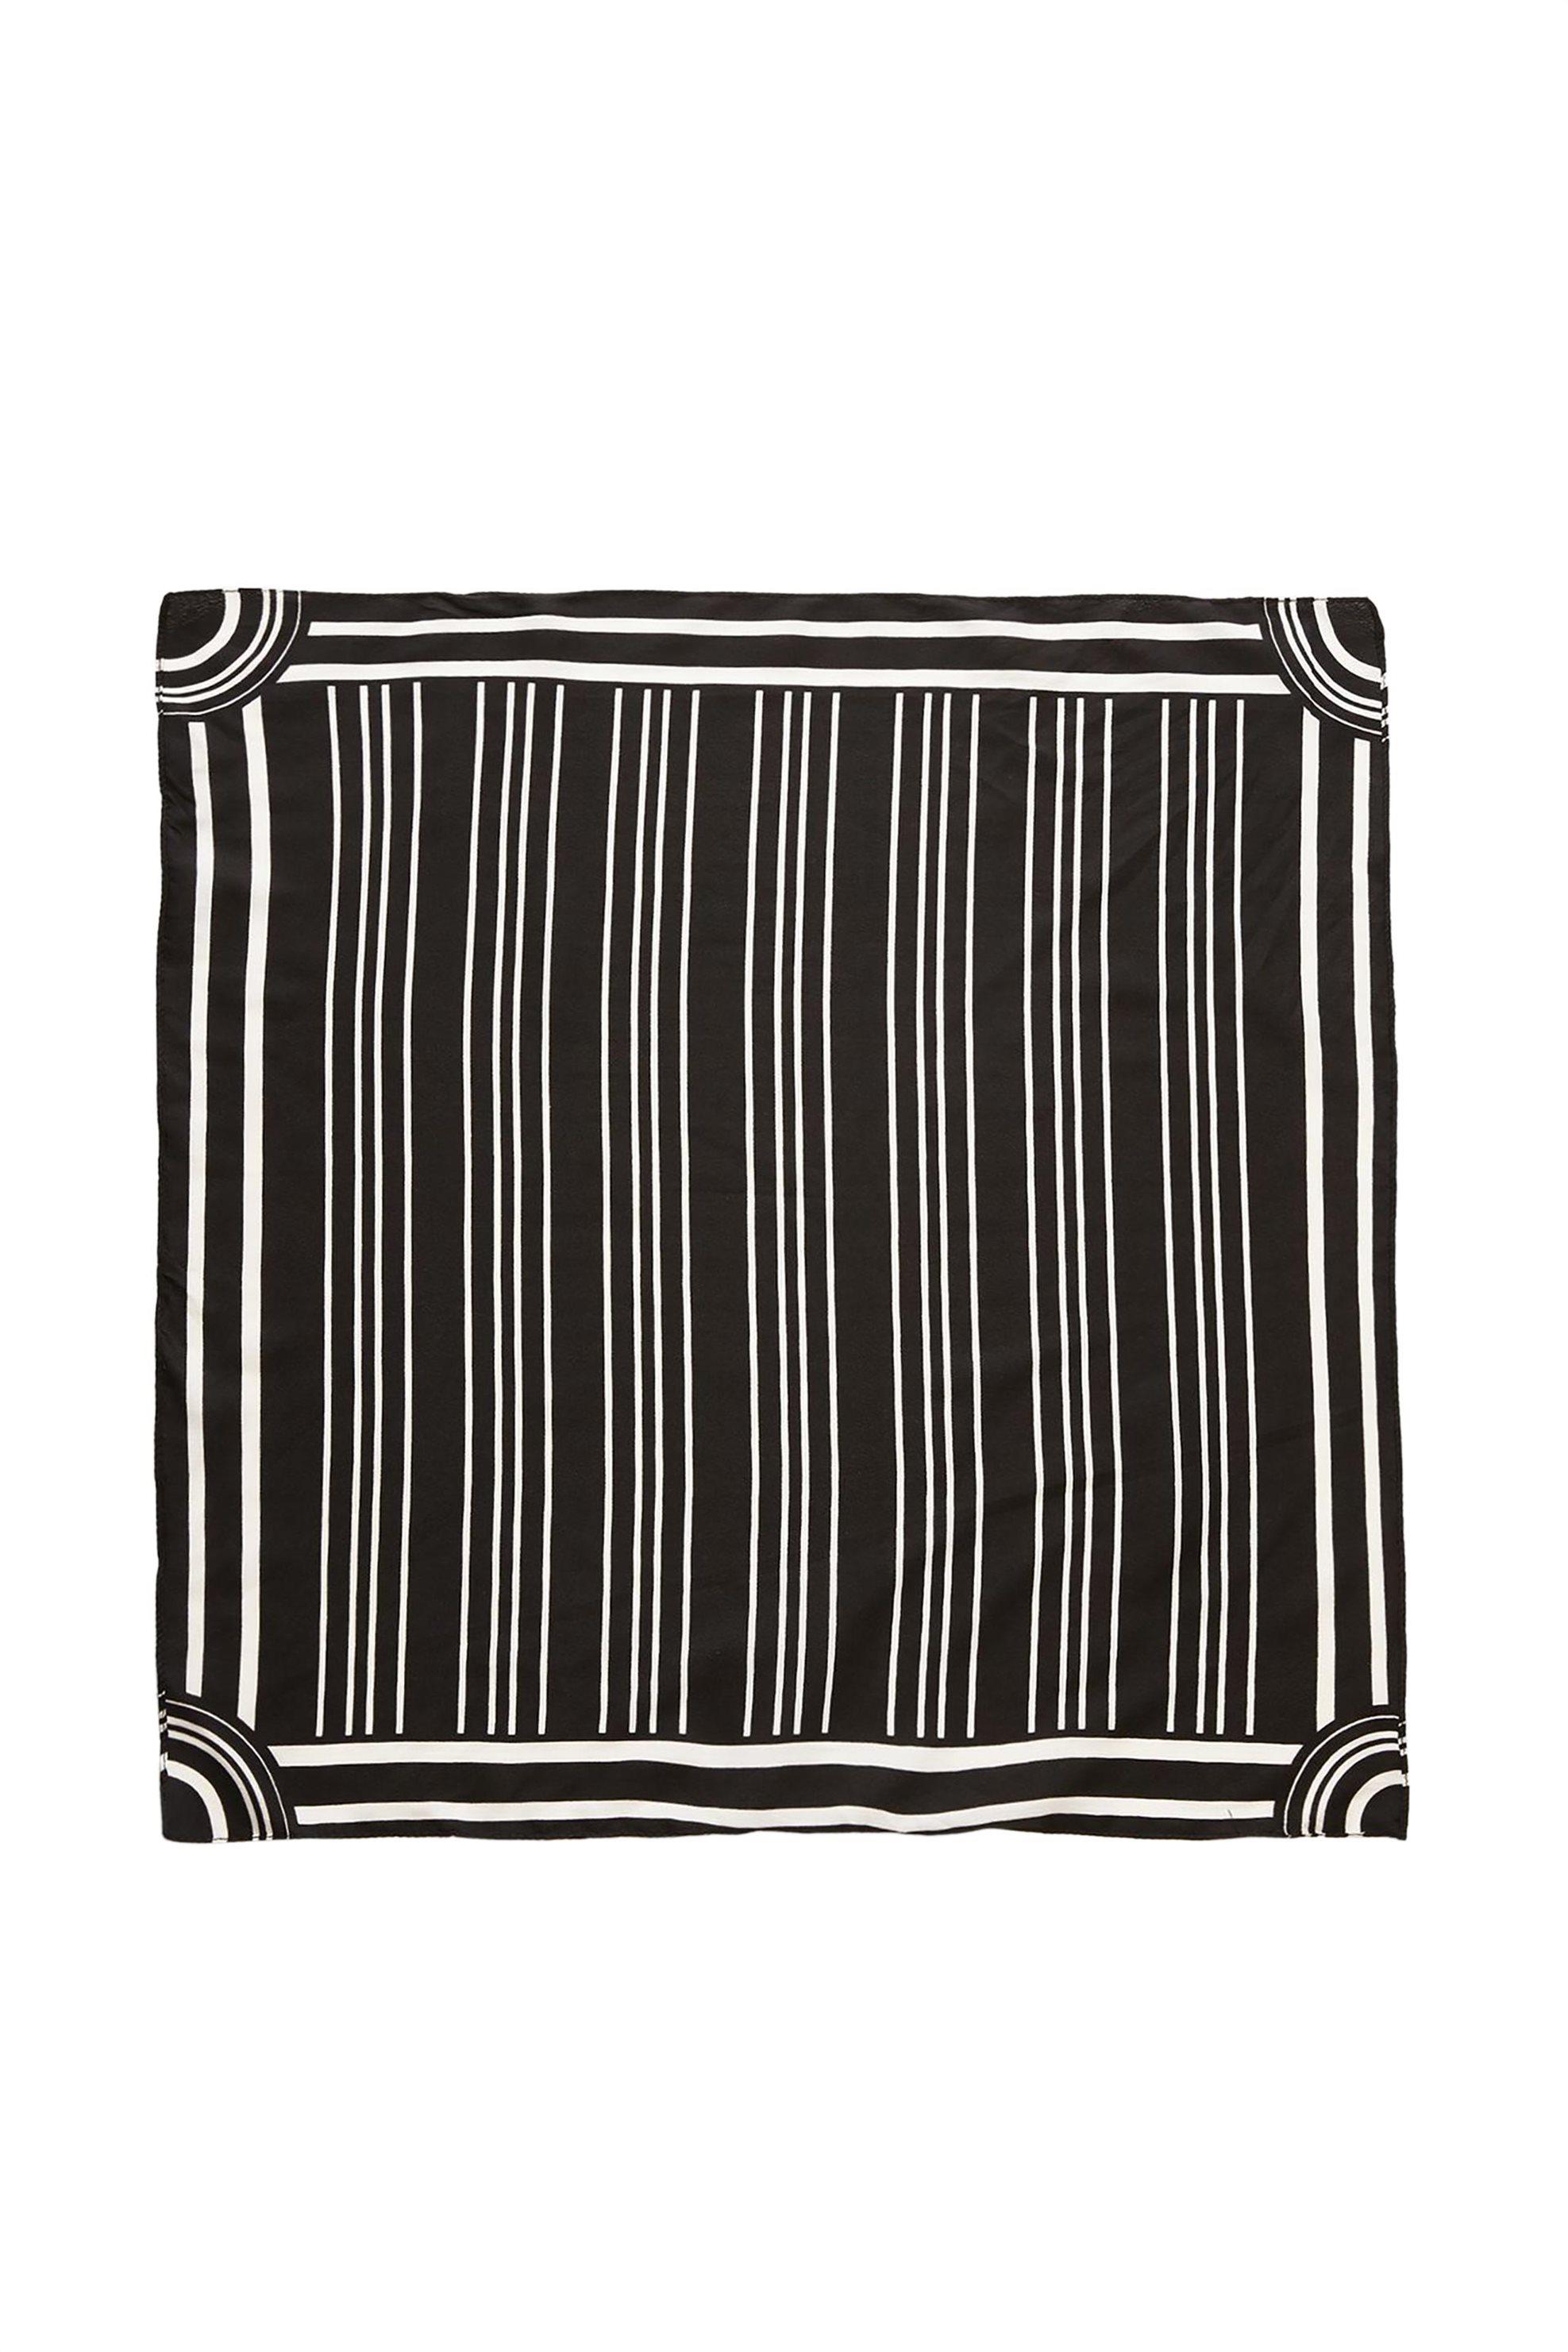 PIECES γυναικείo ασπρόμαυρο φουλάρι με ρίγες - 17096413 - Μαύρο γυναικα   αξεσουαρ   κασκόλ   μαντήλια